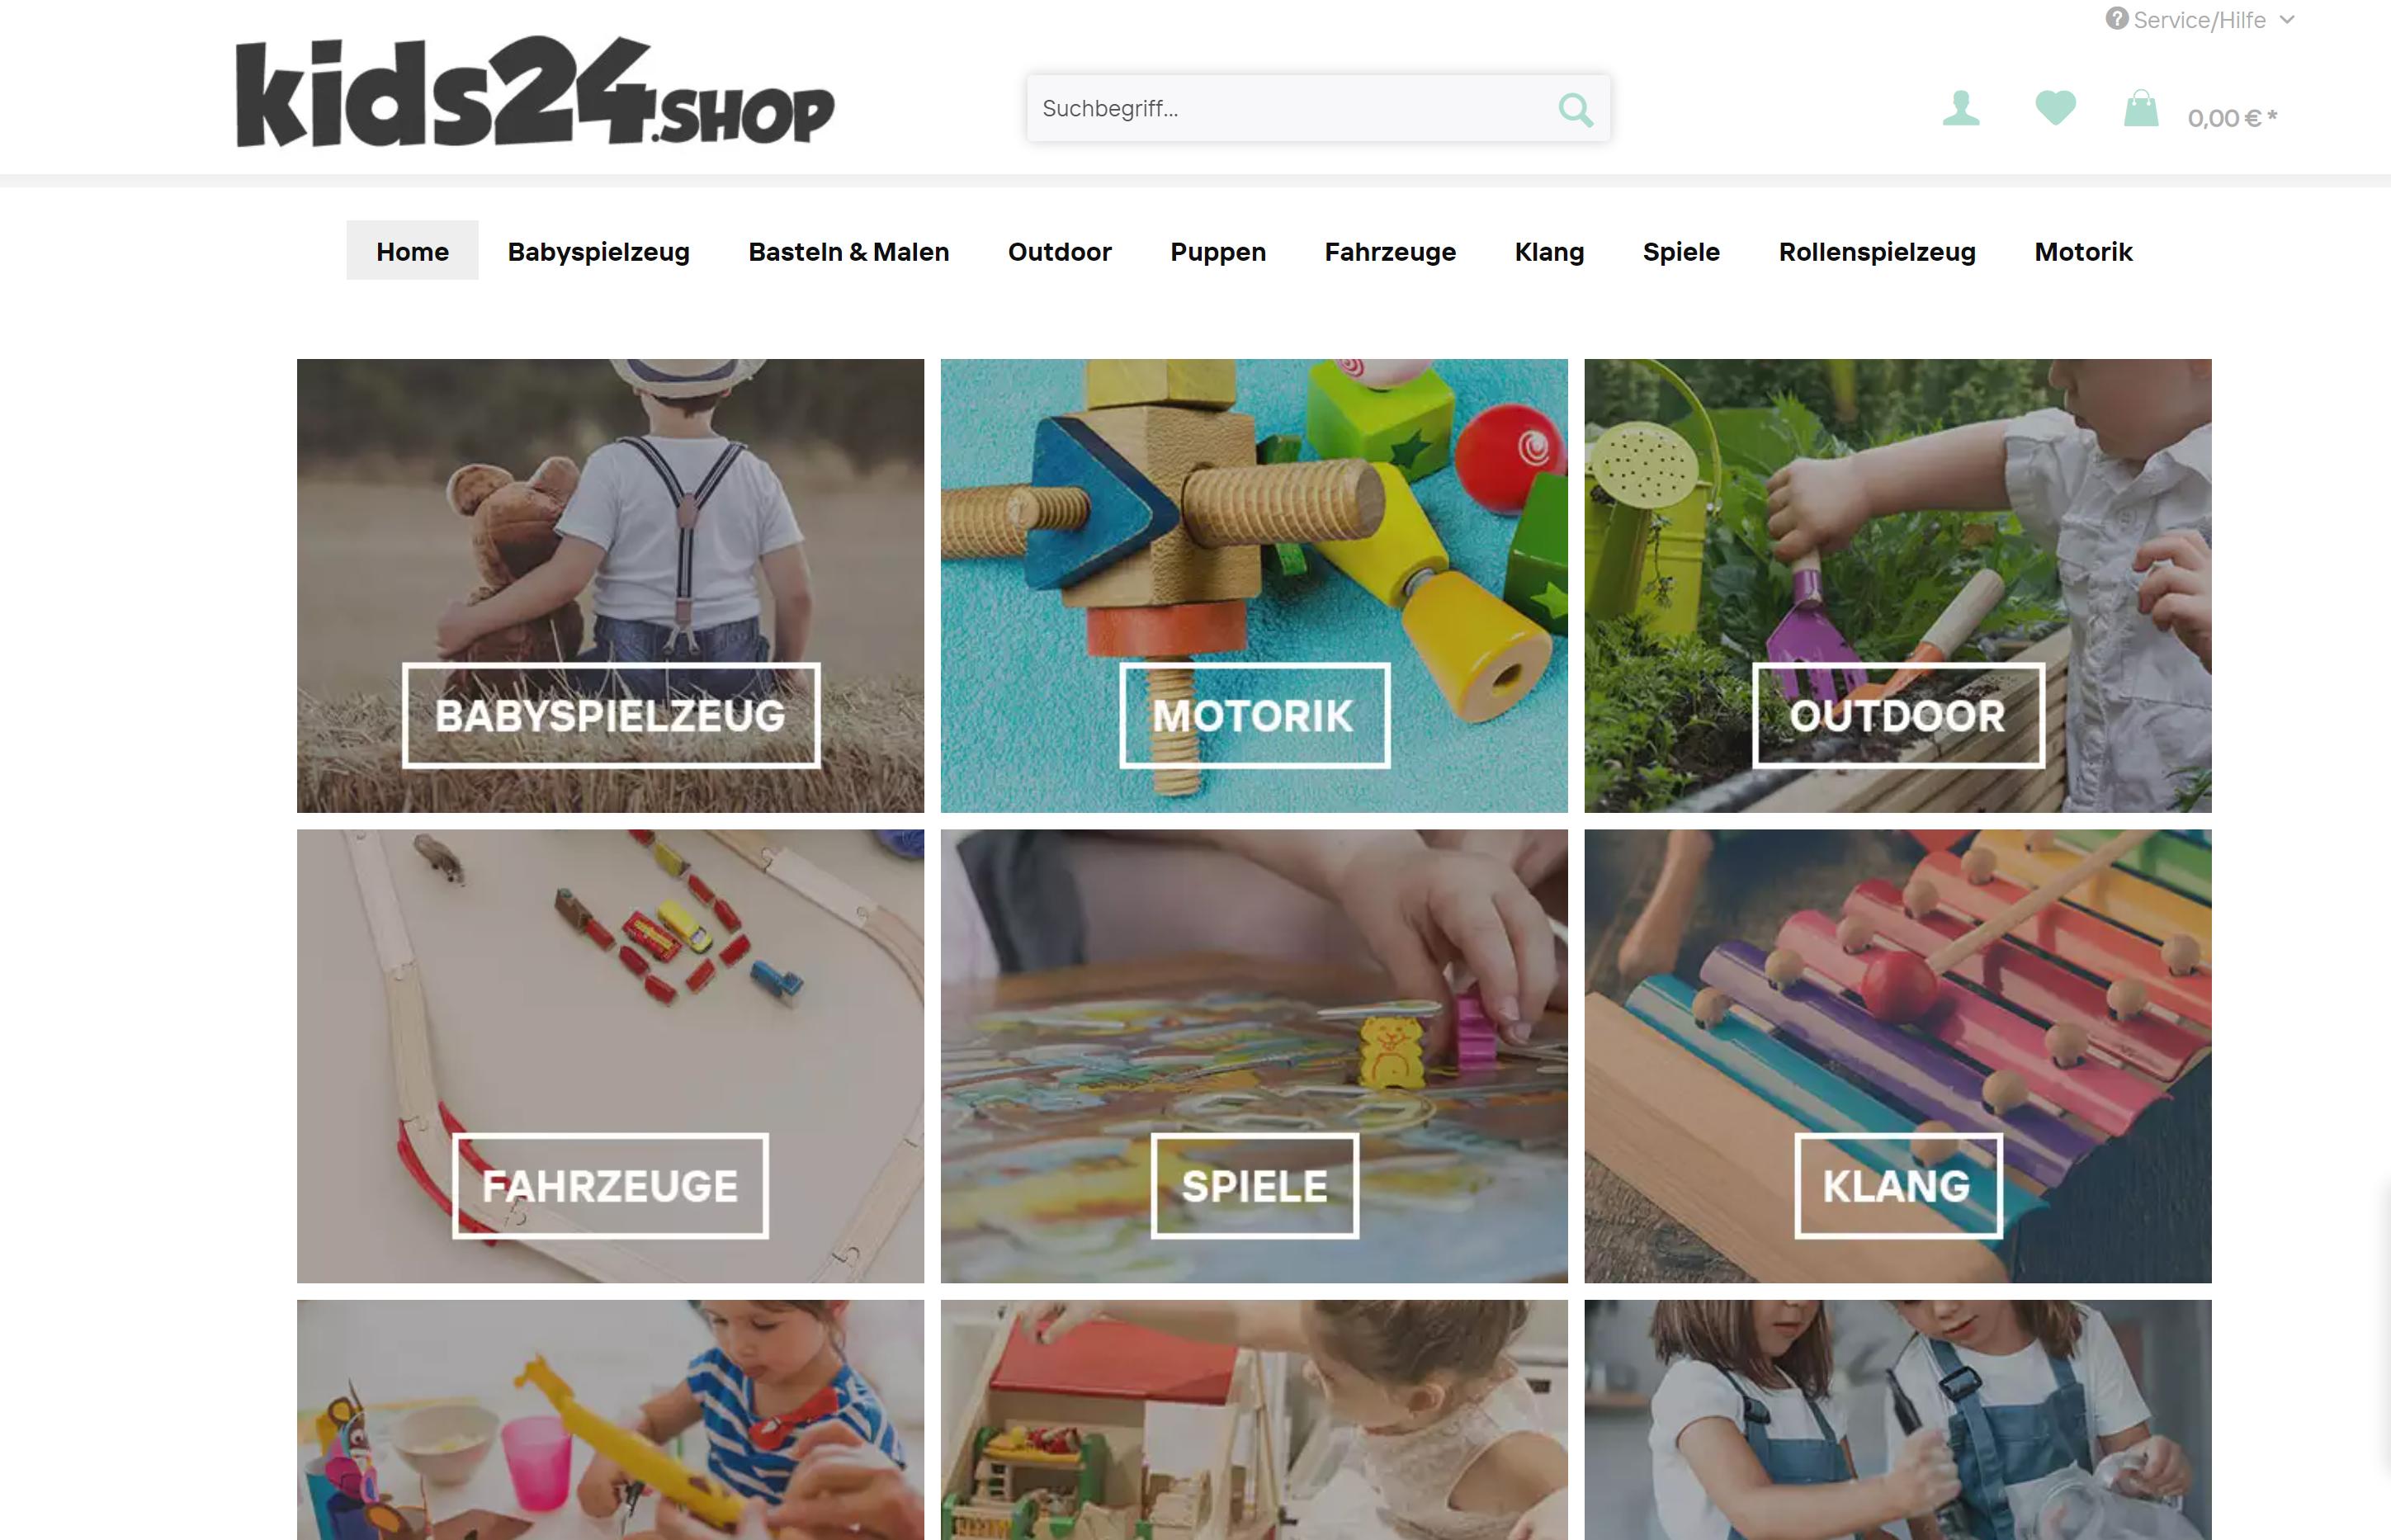 kids24.shop